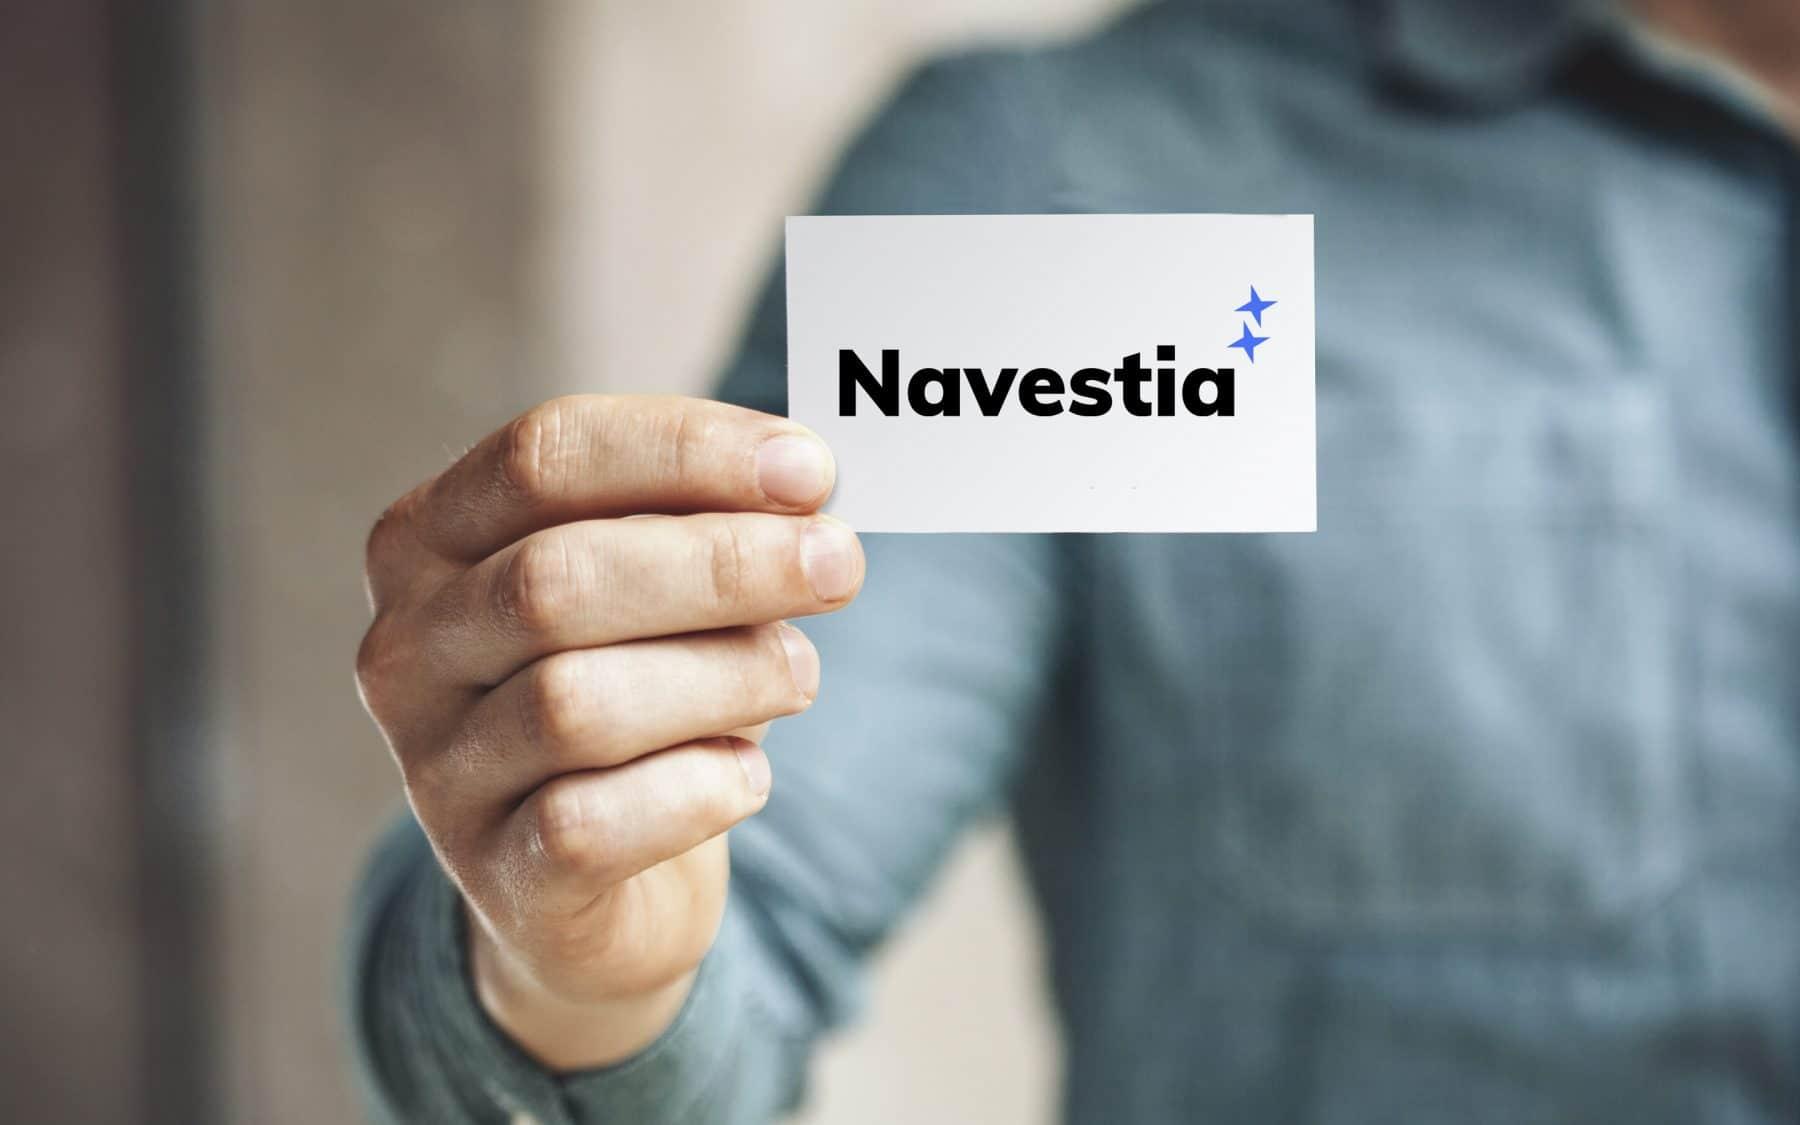 Navestia